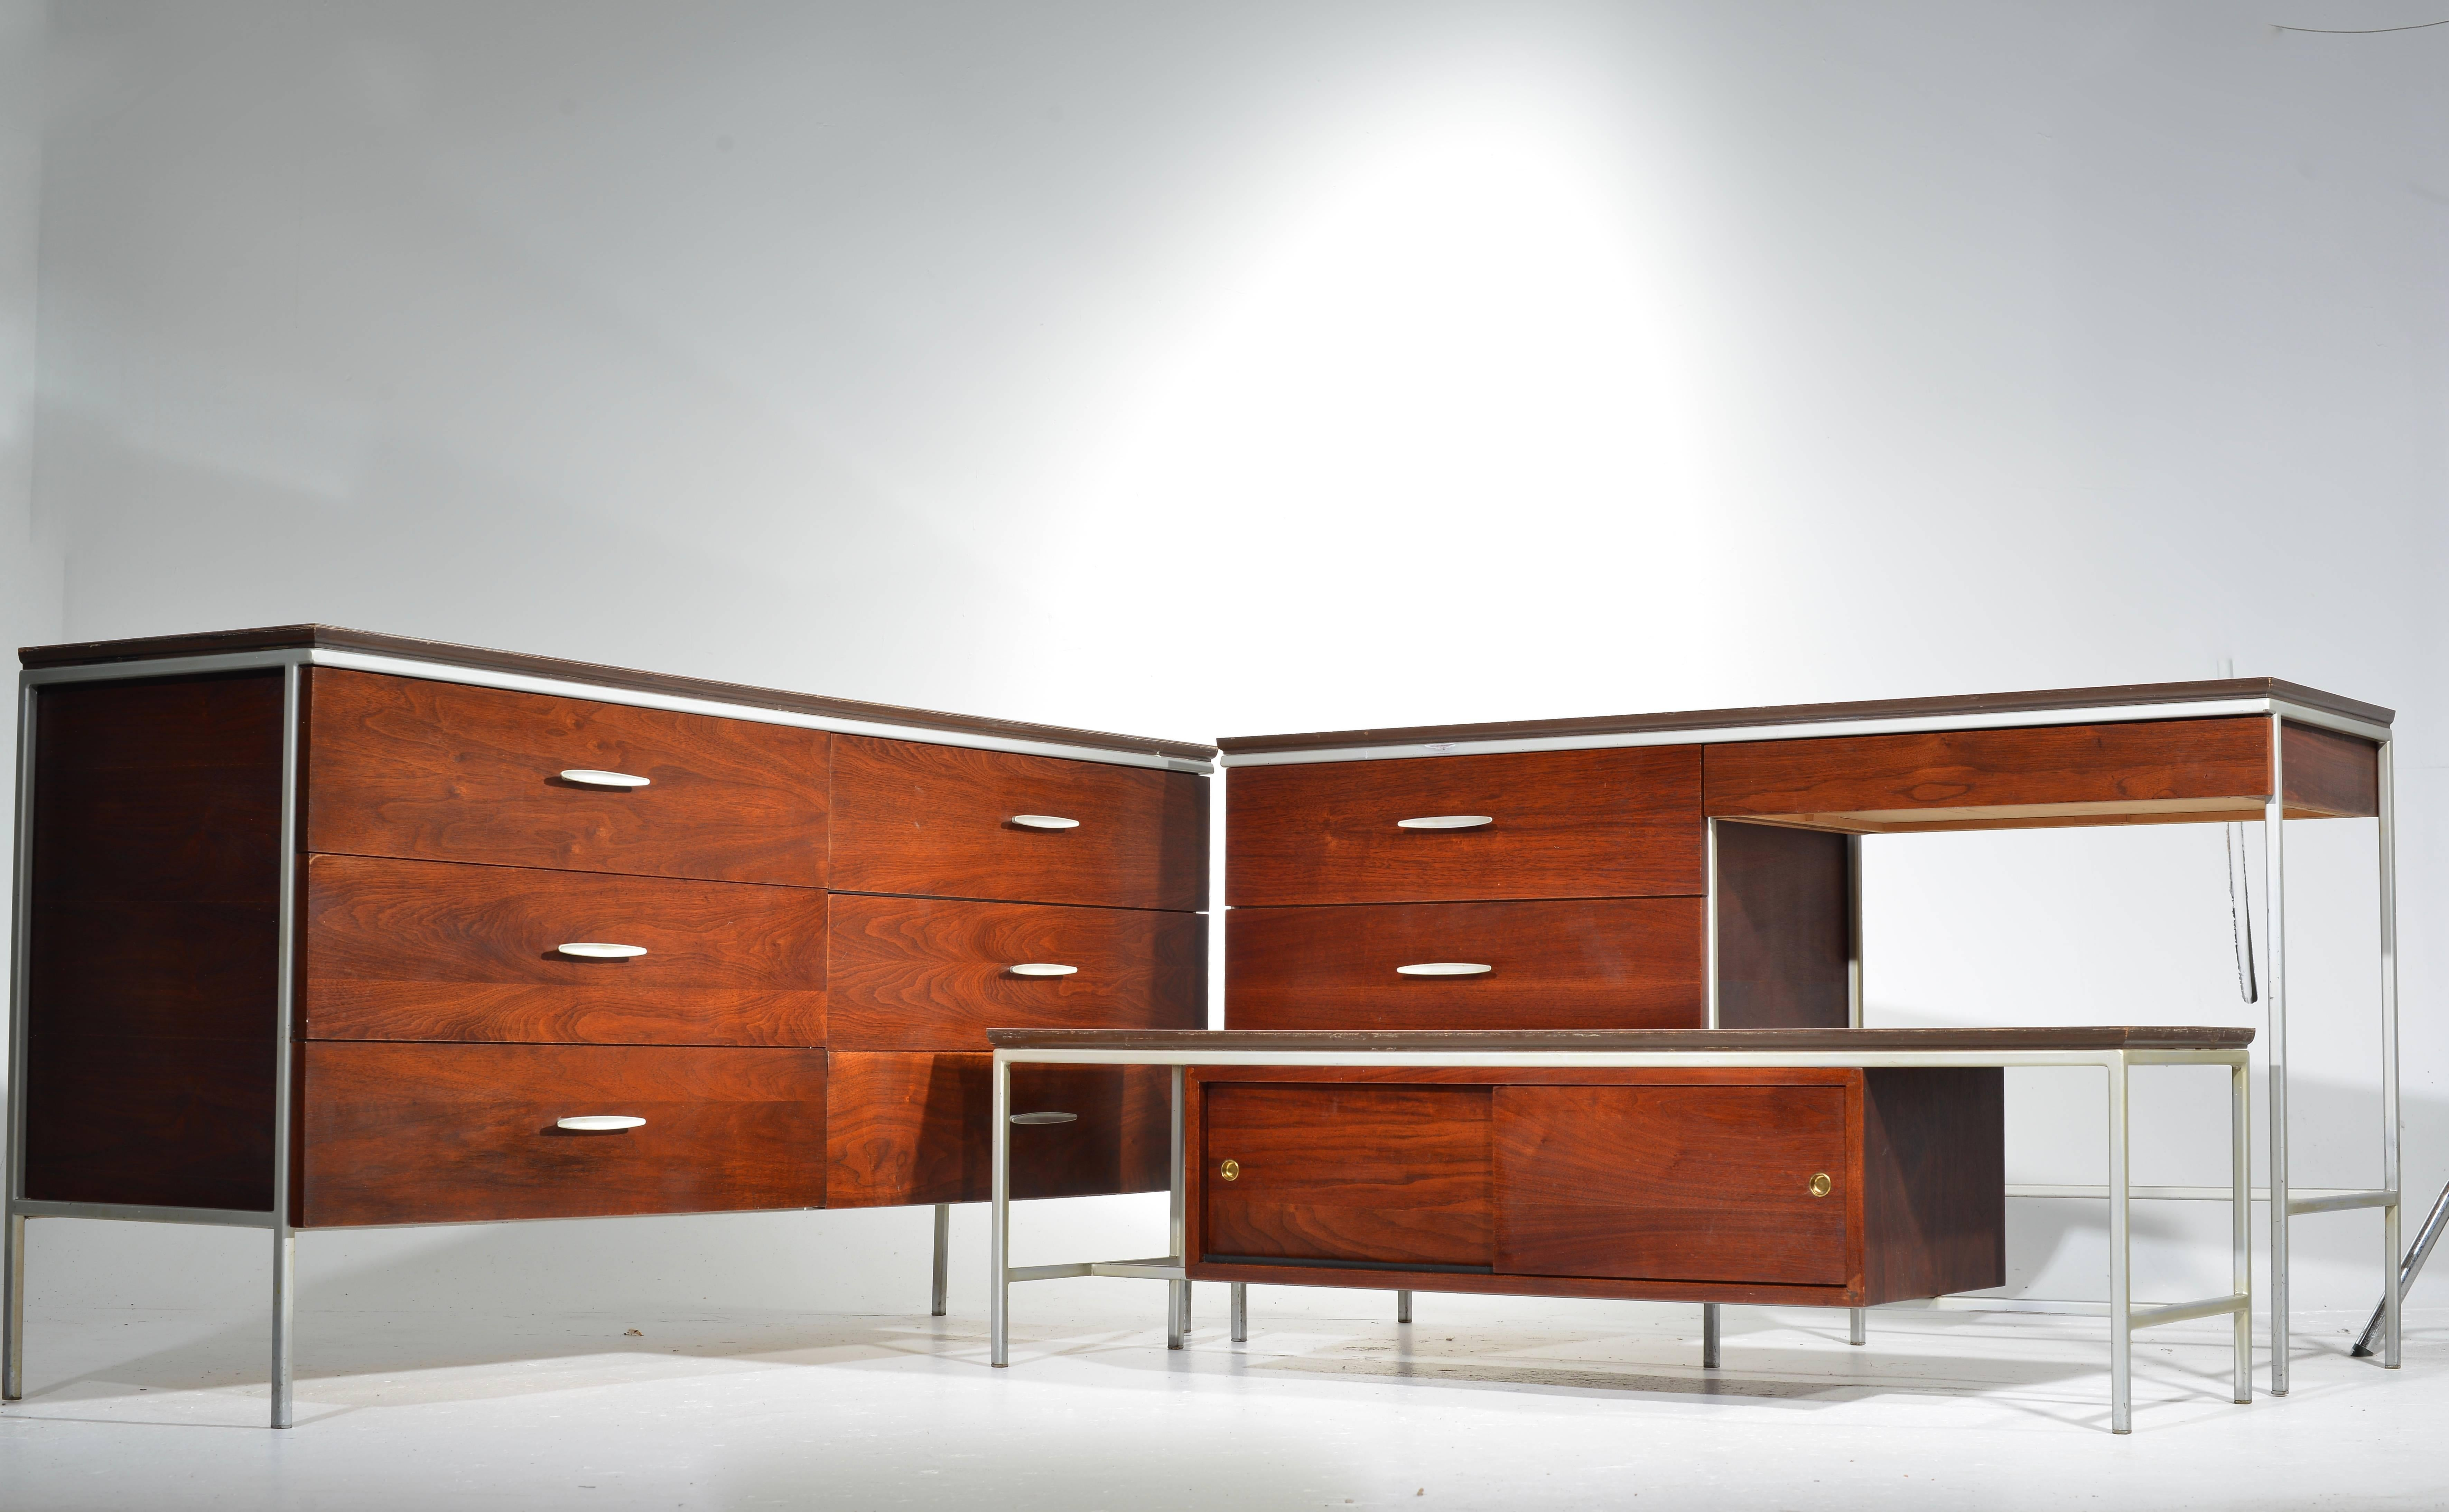 Vista Of California Walnut And Formica Bedroom Set Including Six Drawer  Dresser, Four